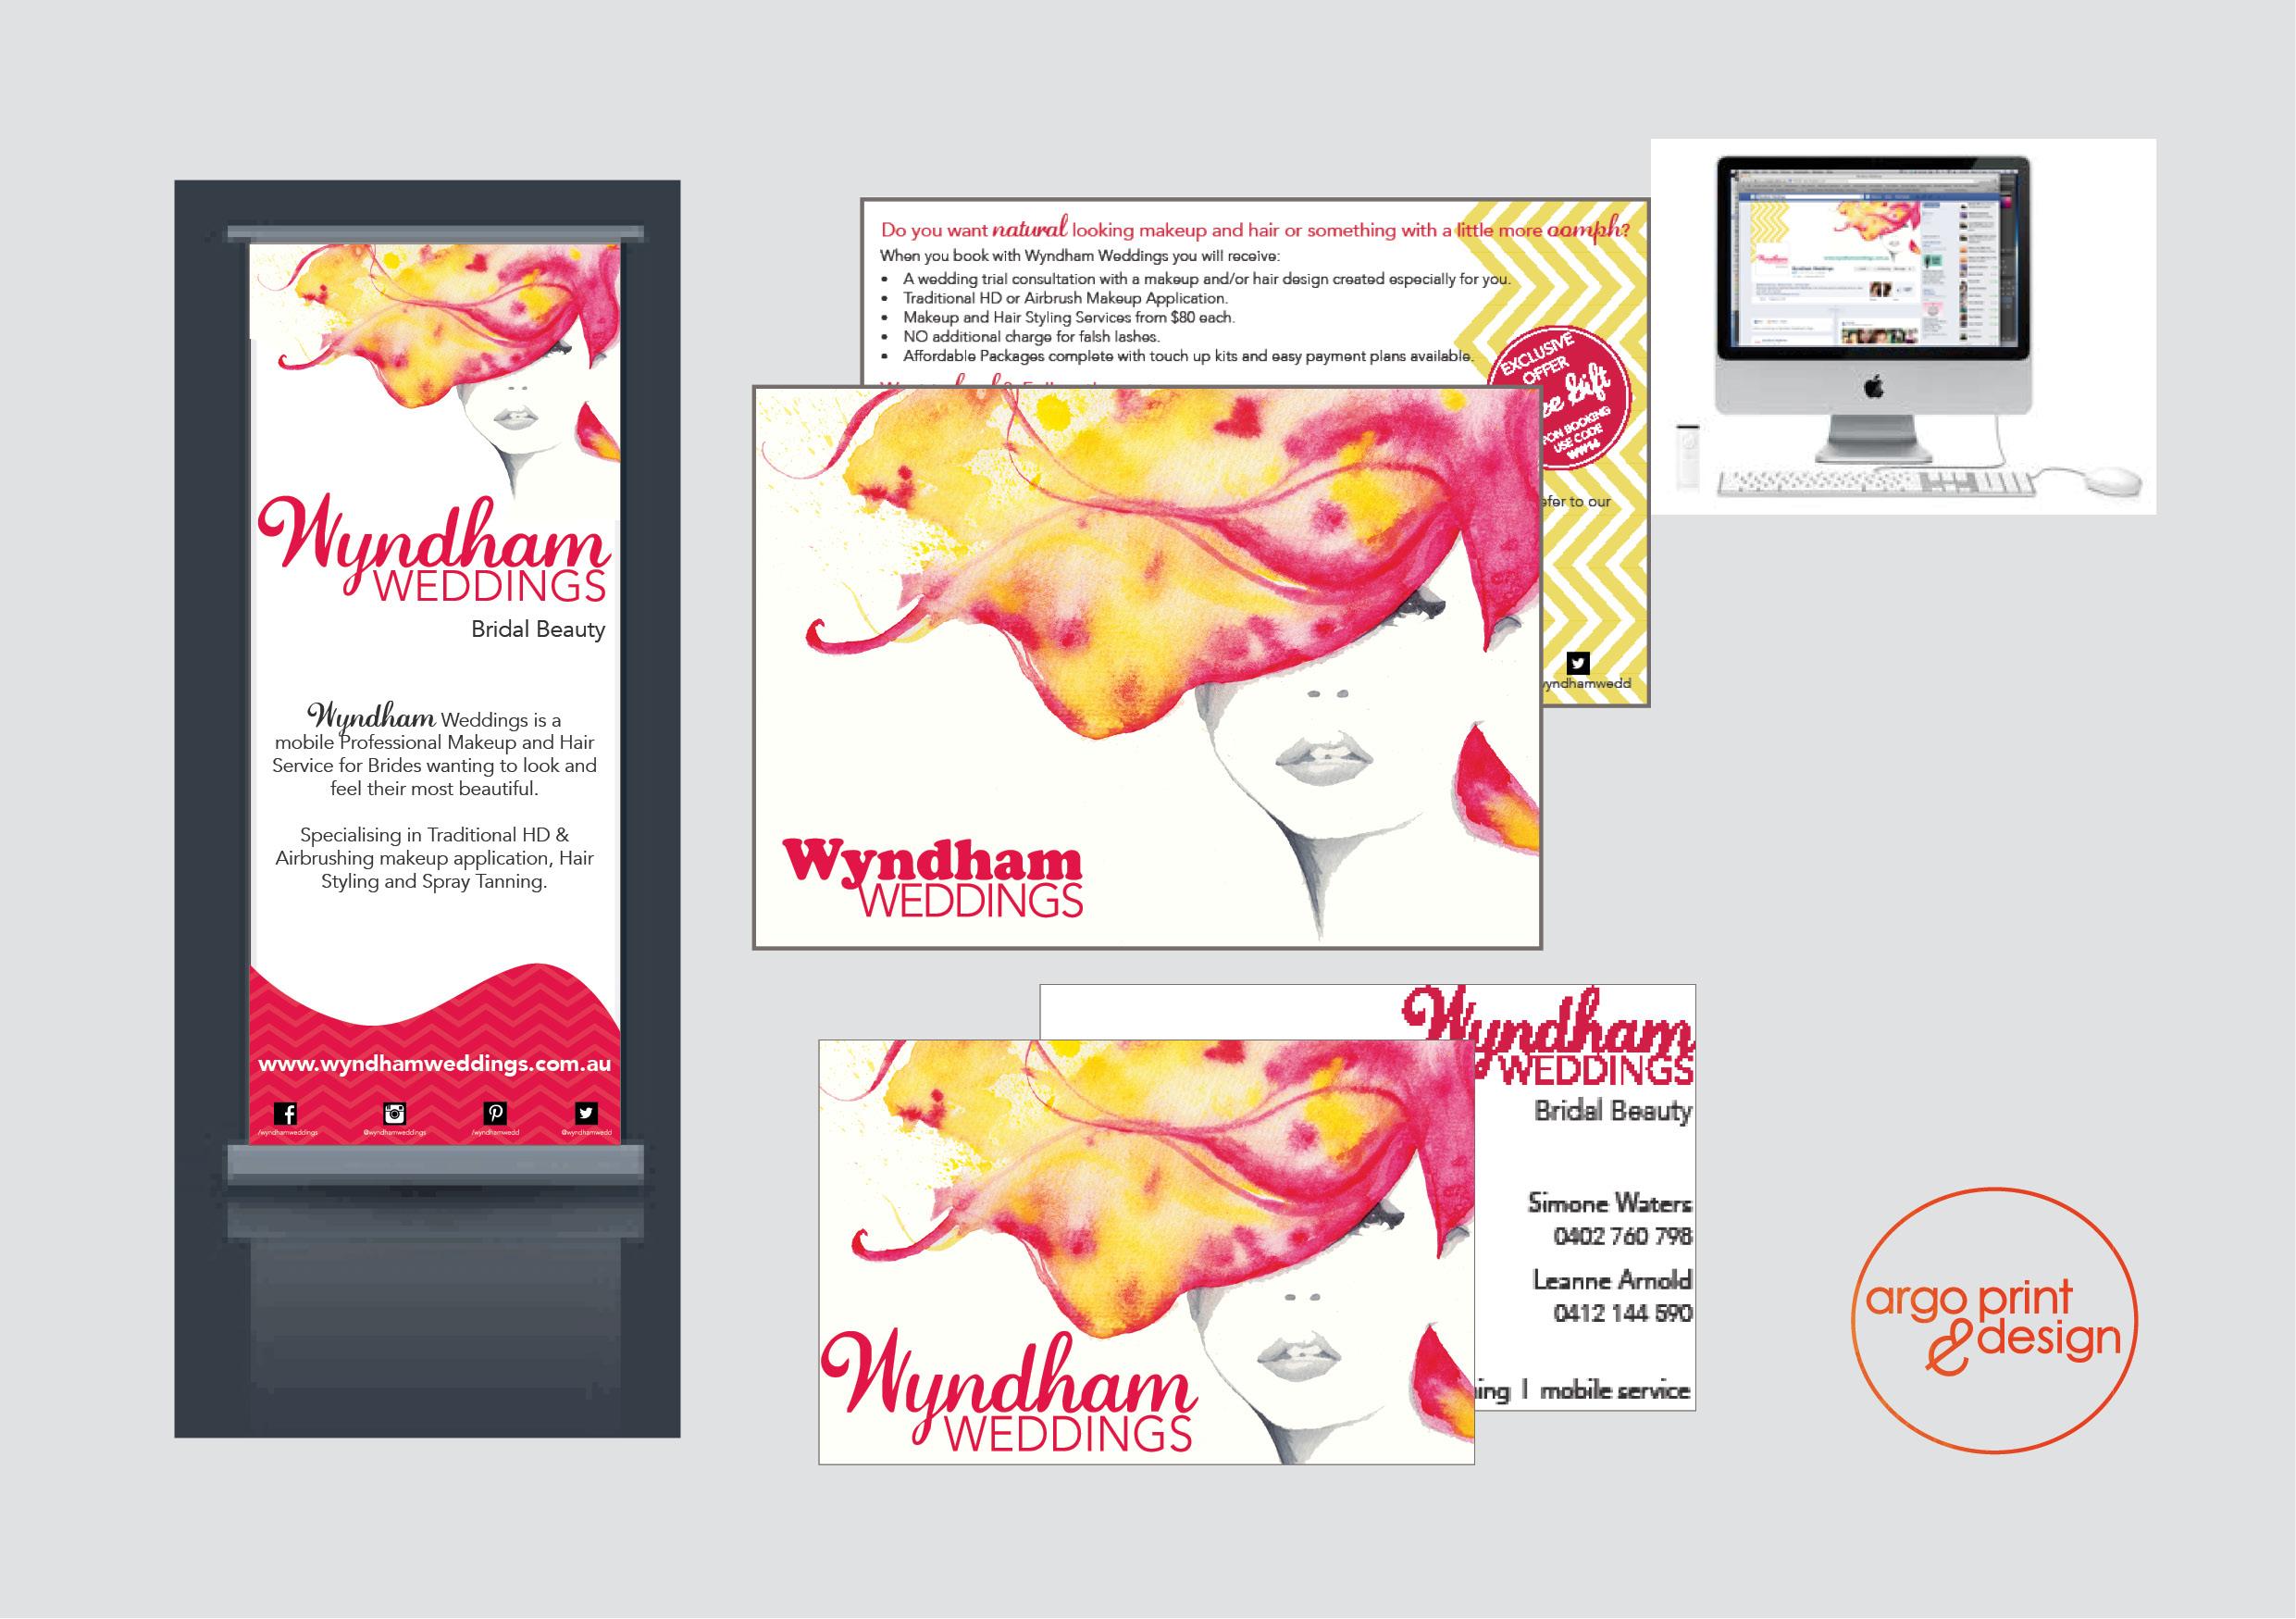 Wyndham Weddings - Volume 1